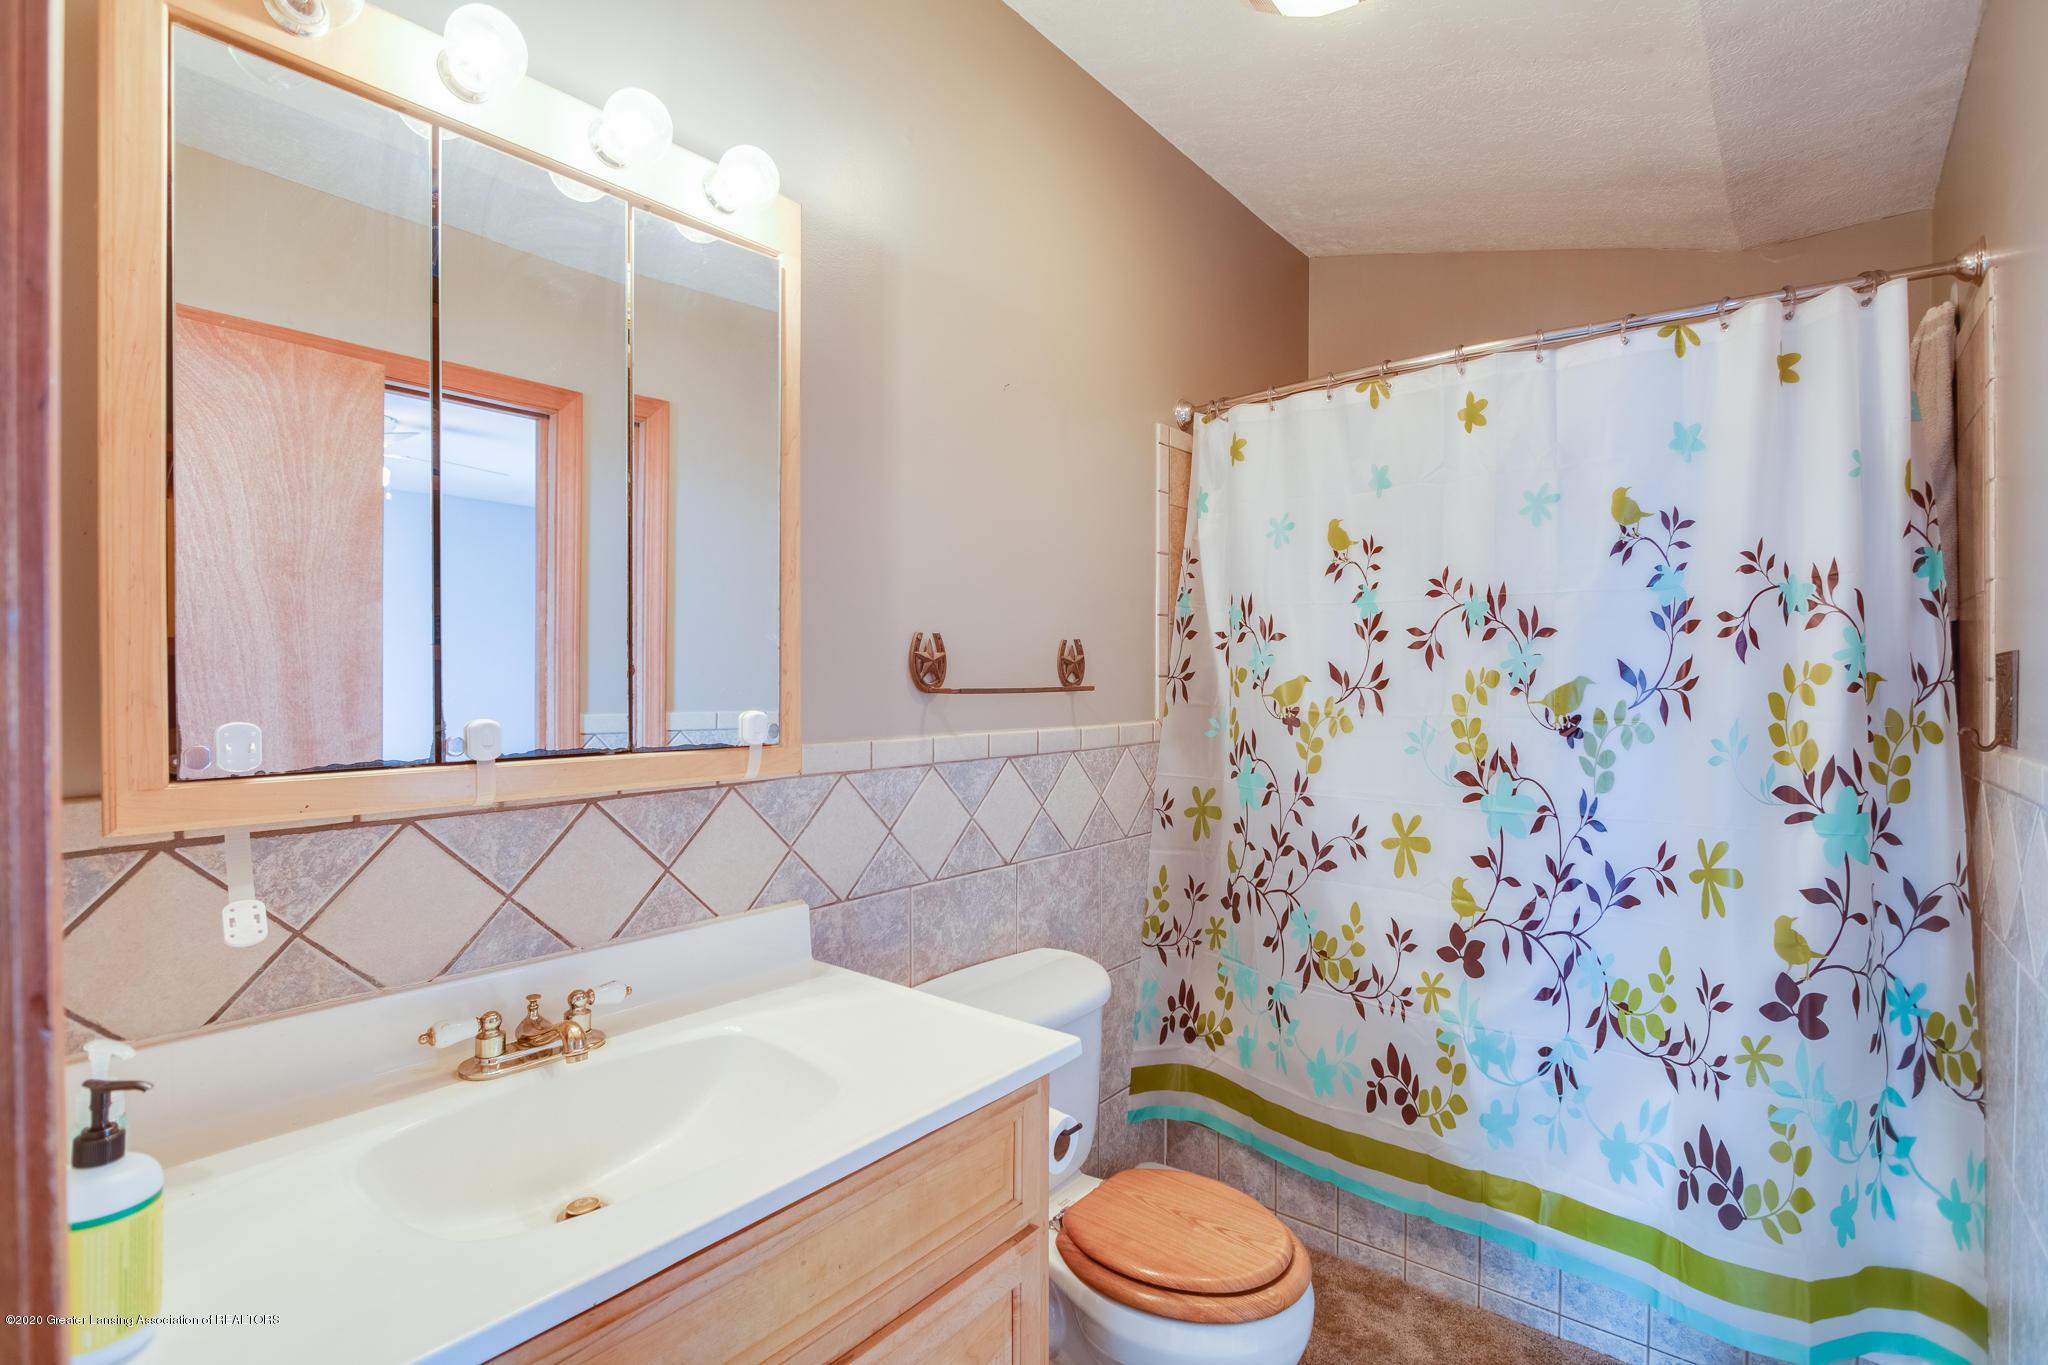 11557 S Croswell Rd - Bathroom - 15